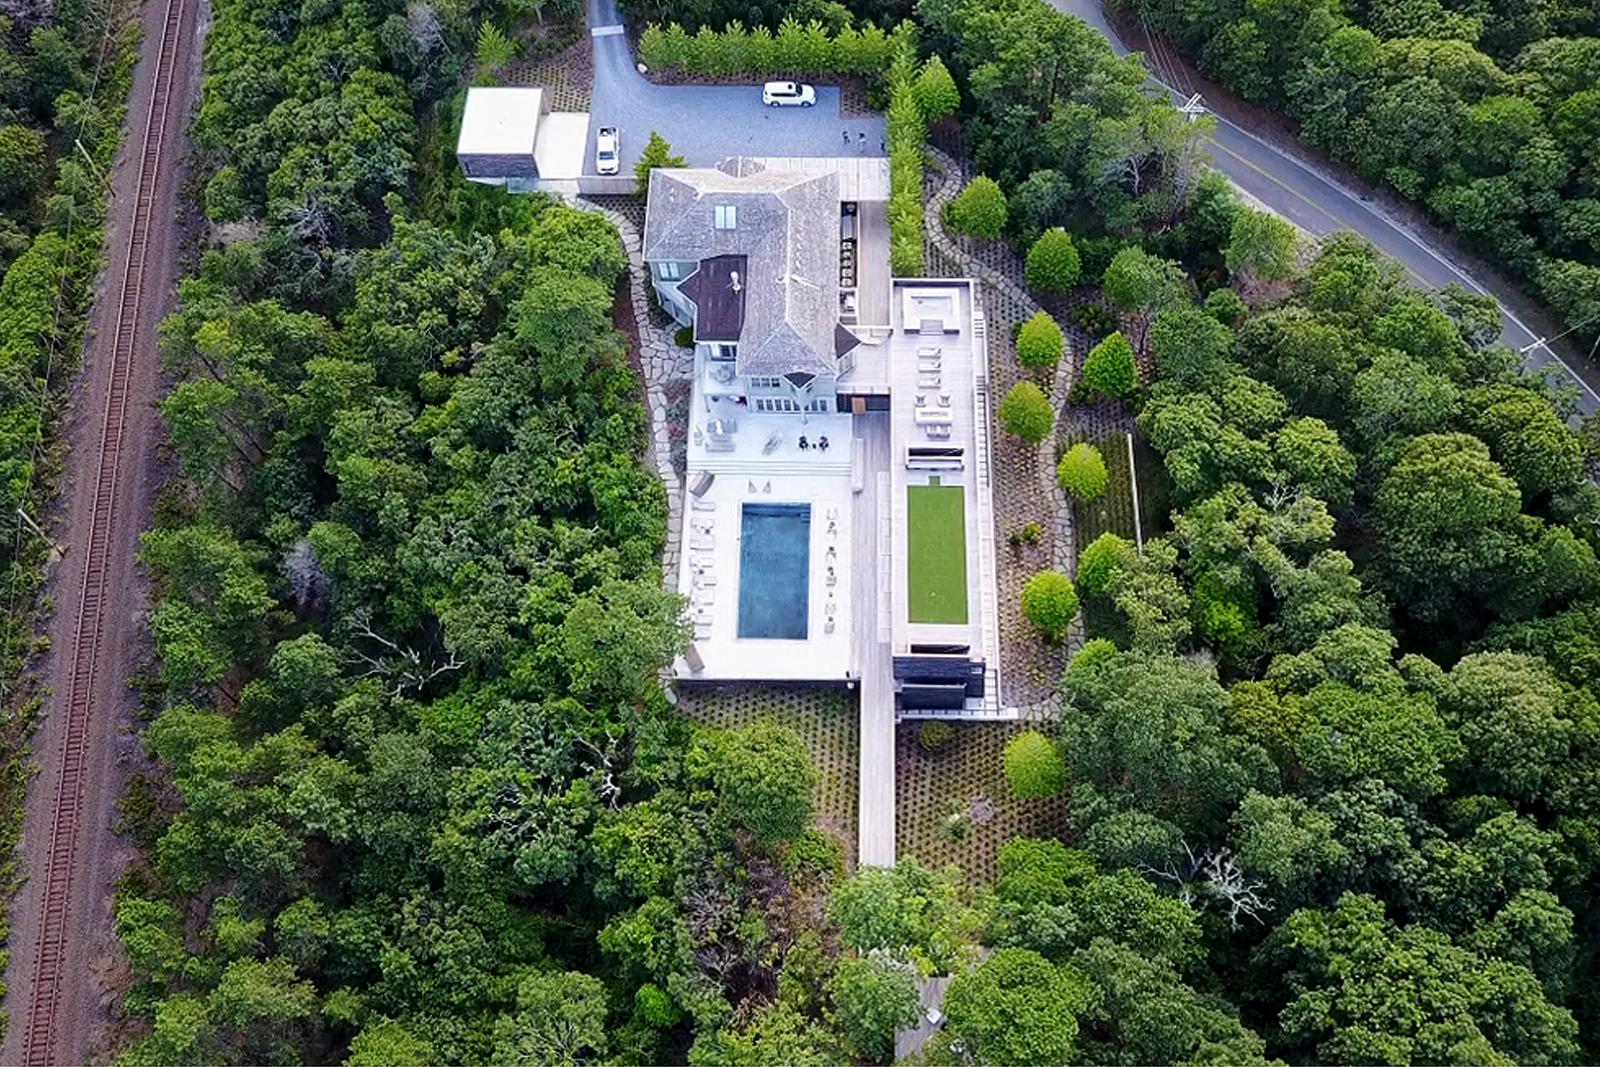 res4-resolution-4-architecture-modern-modular-house-prefab-amagansett-addition-exterior-site-aerial-view.jpg